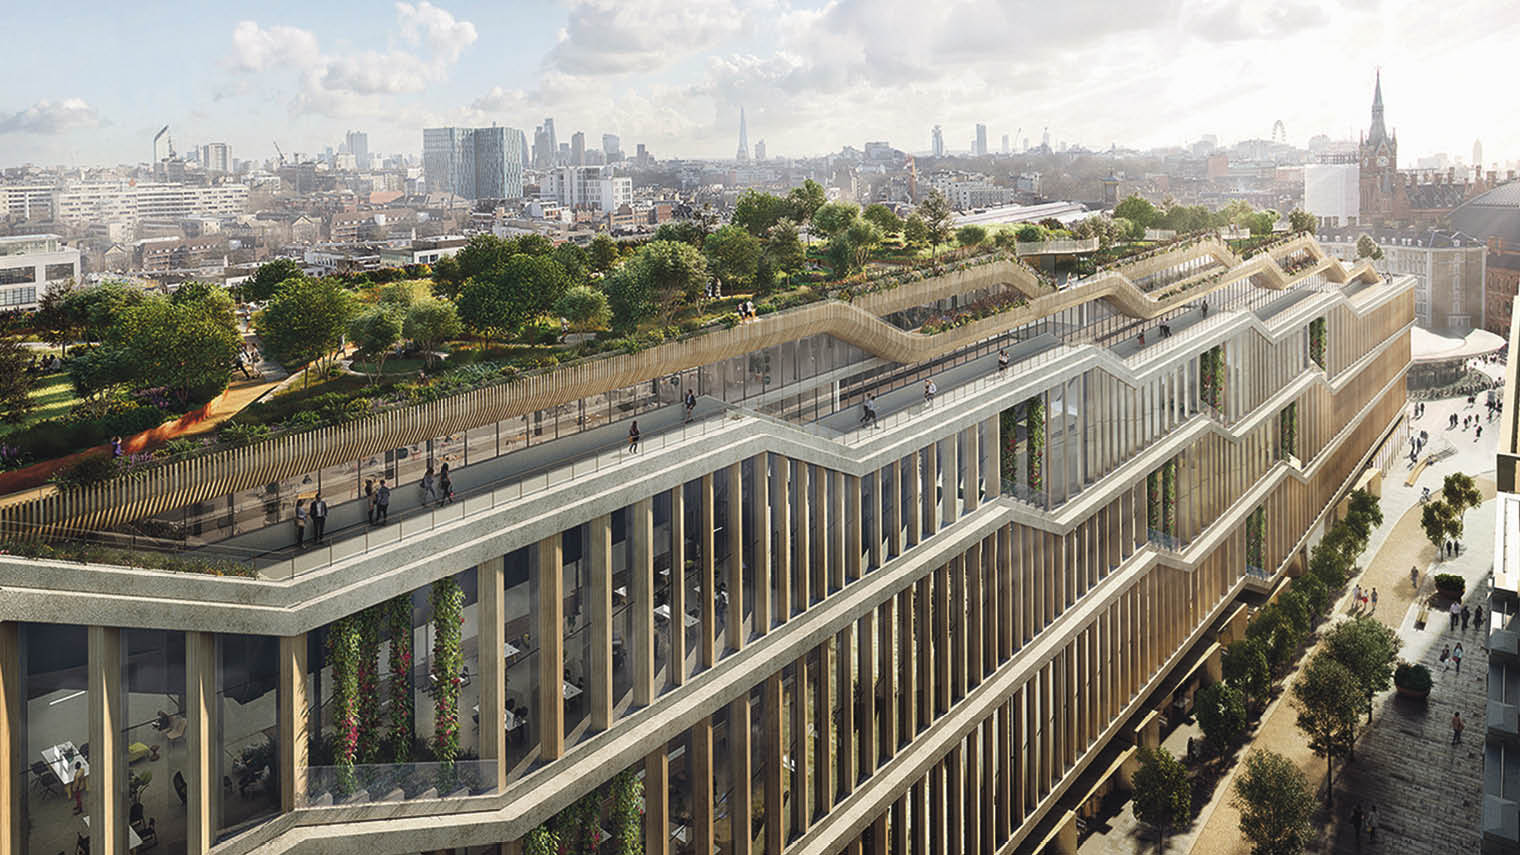 Google's planned London headquarters near King's Cross, designed by Heatherwick Studio and Bjarke Ingels Group